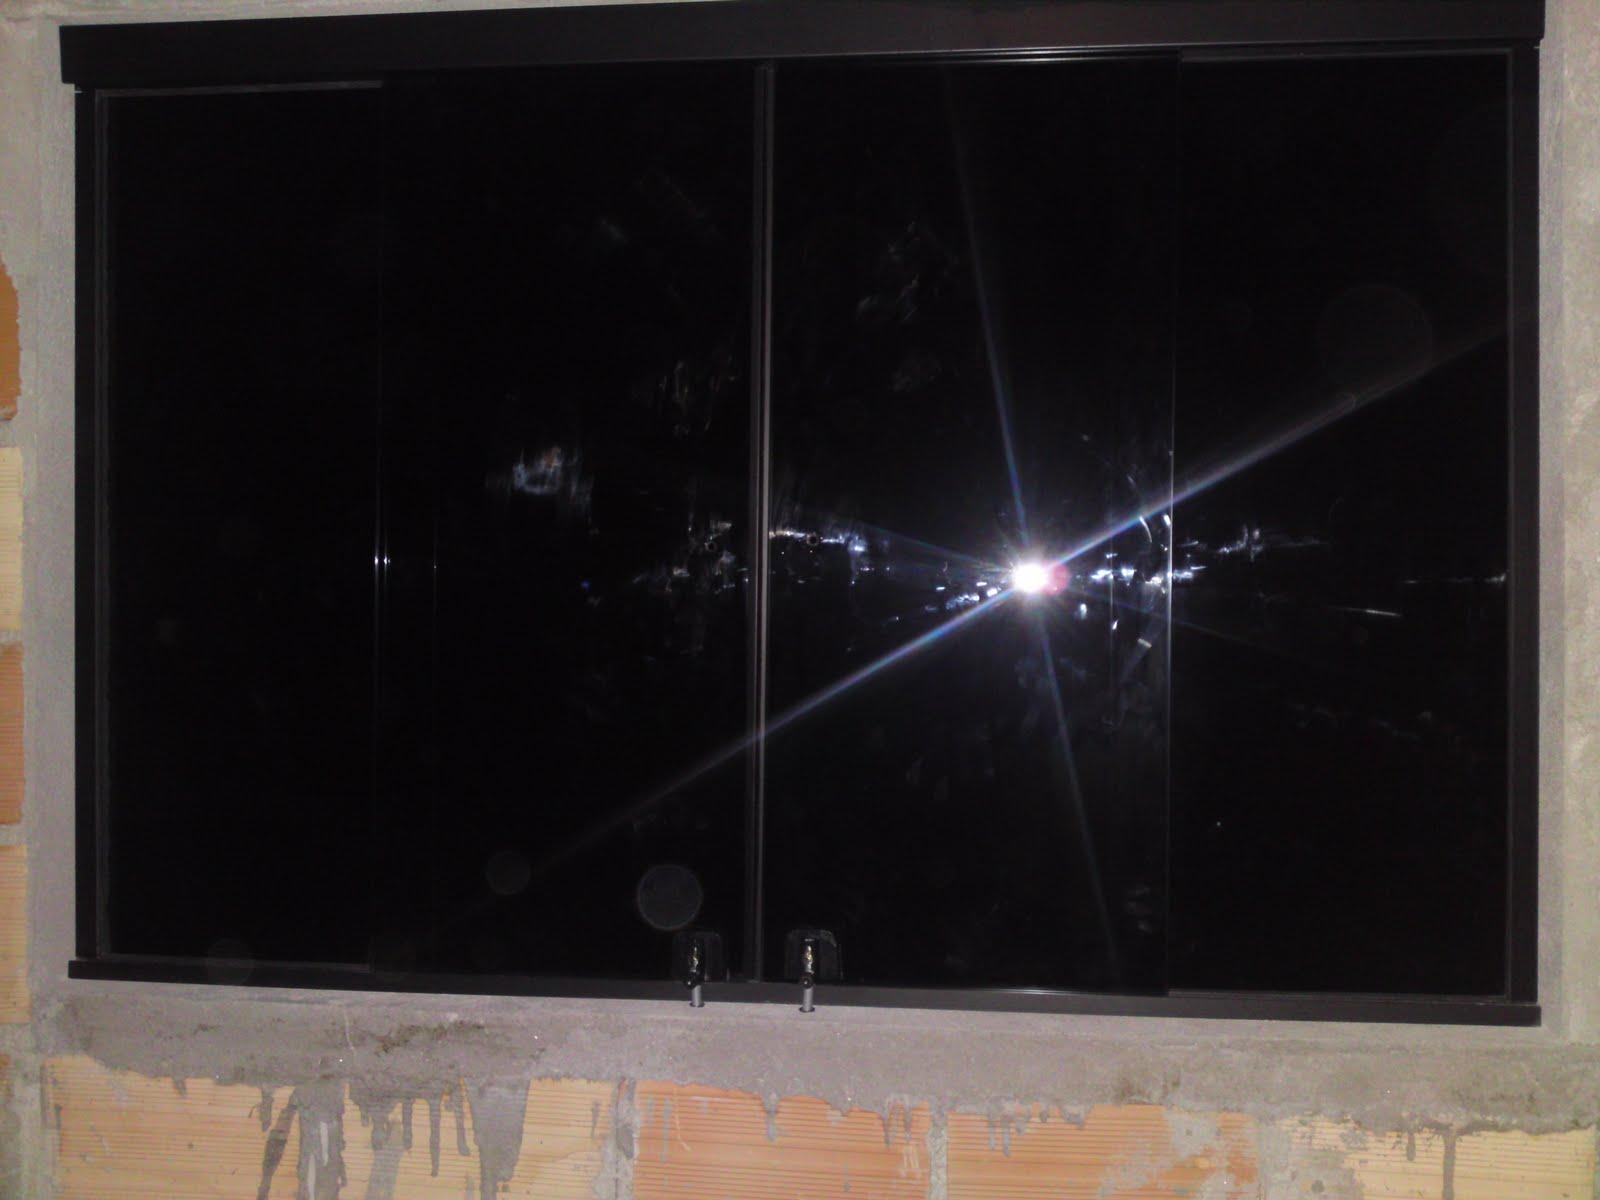 #876144 quarta feira 8 de fevereiro de 2012 fumê janela temperado vidro 0  132 Janelas De Vidro Fume